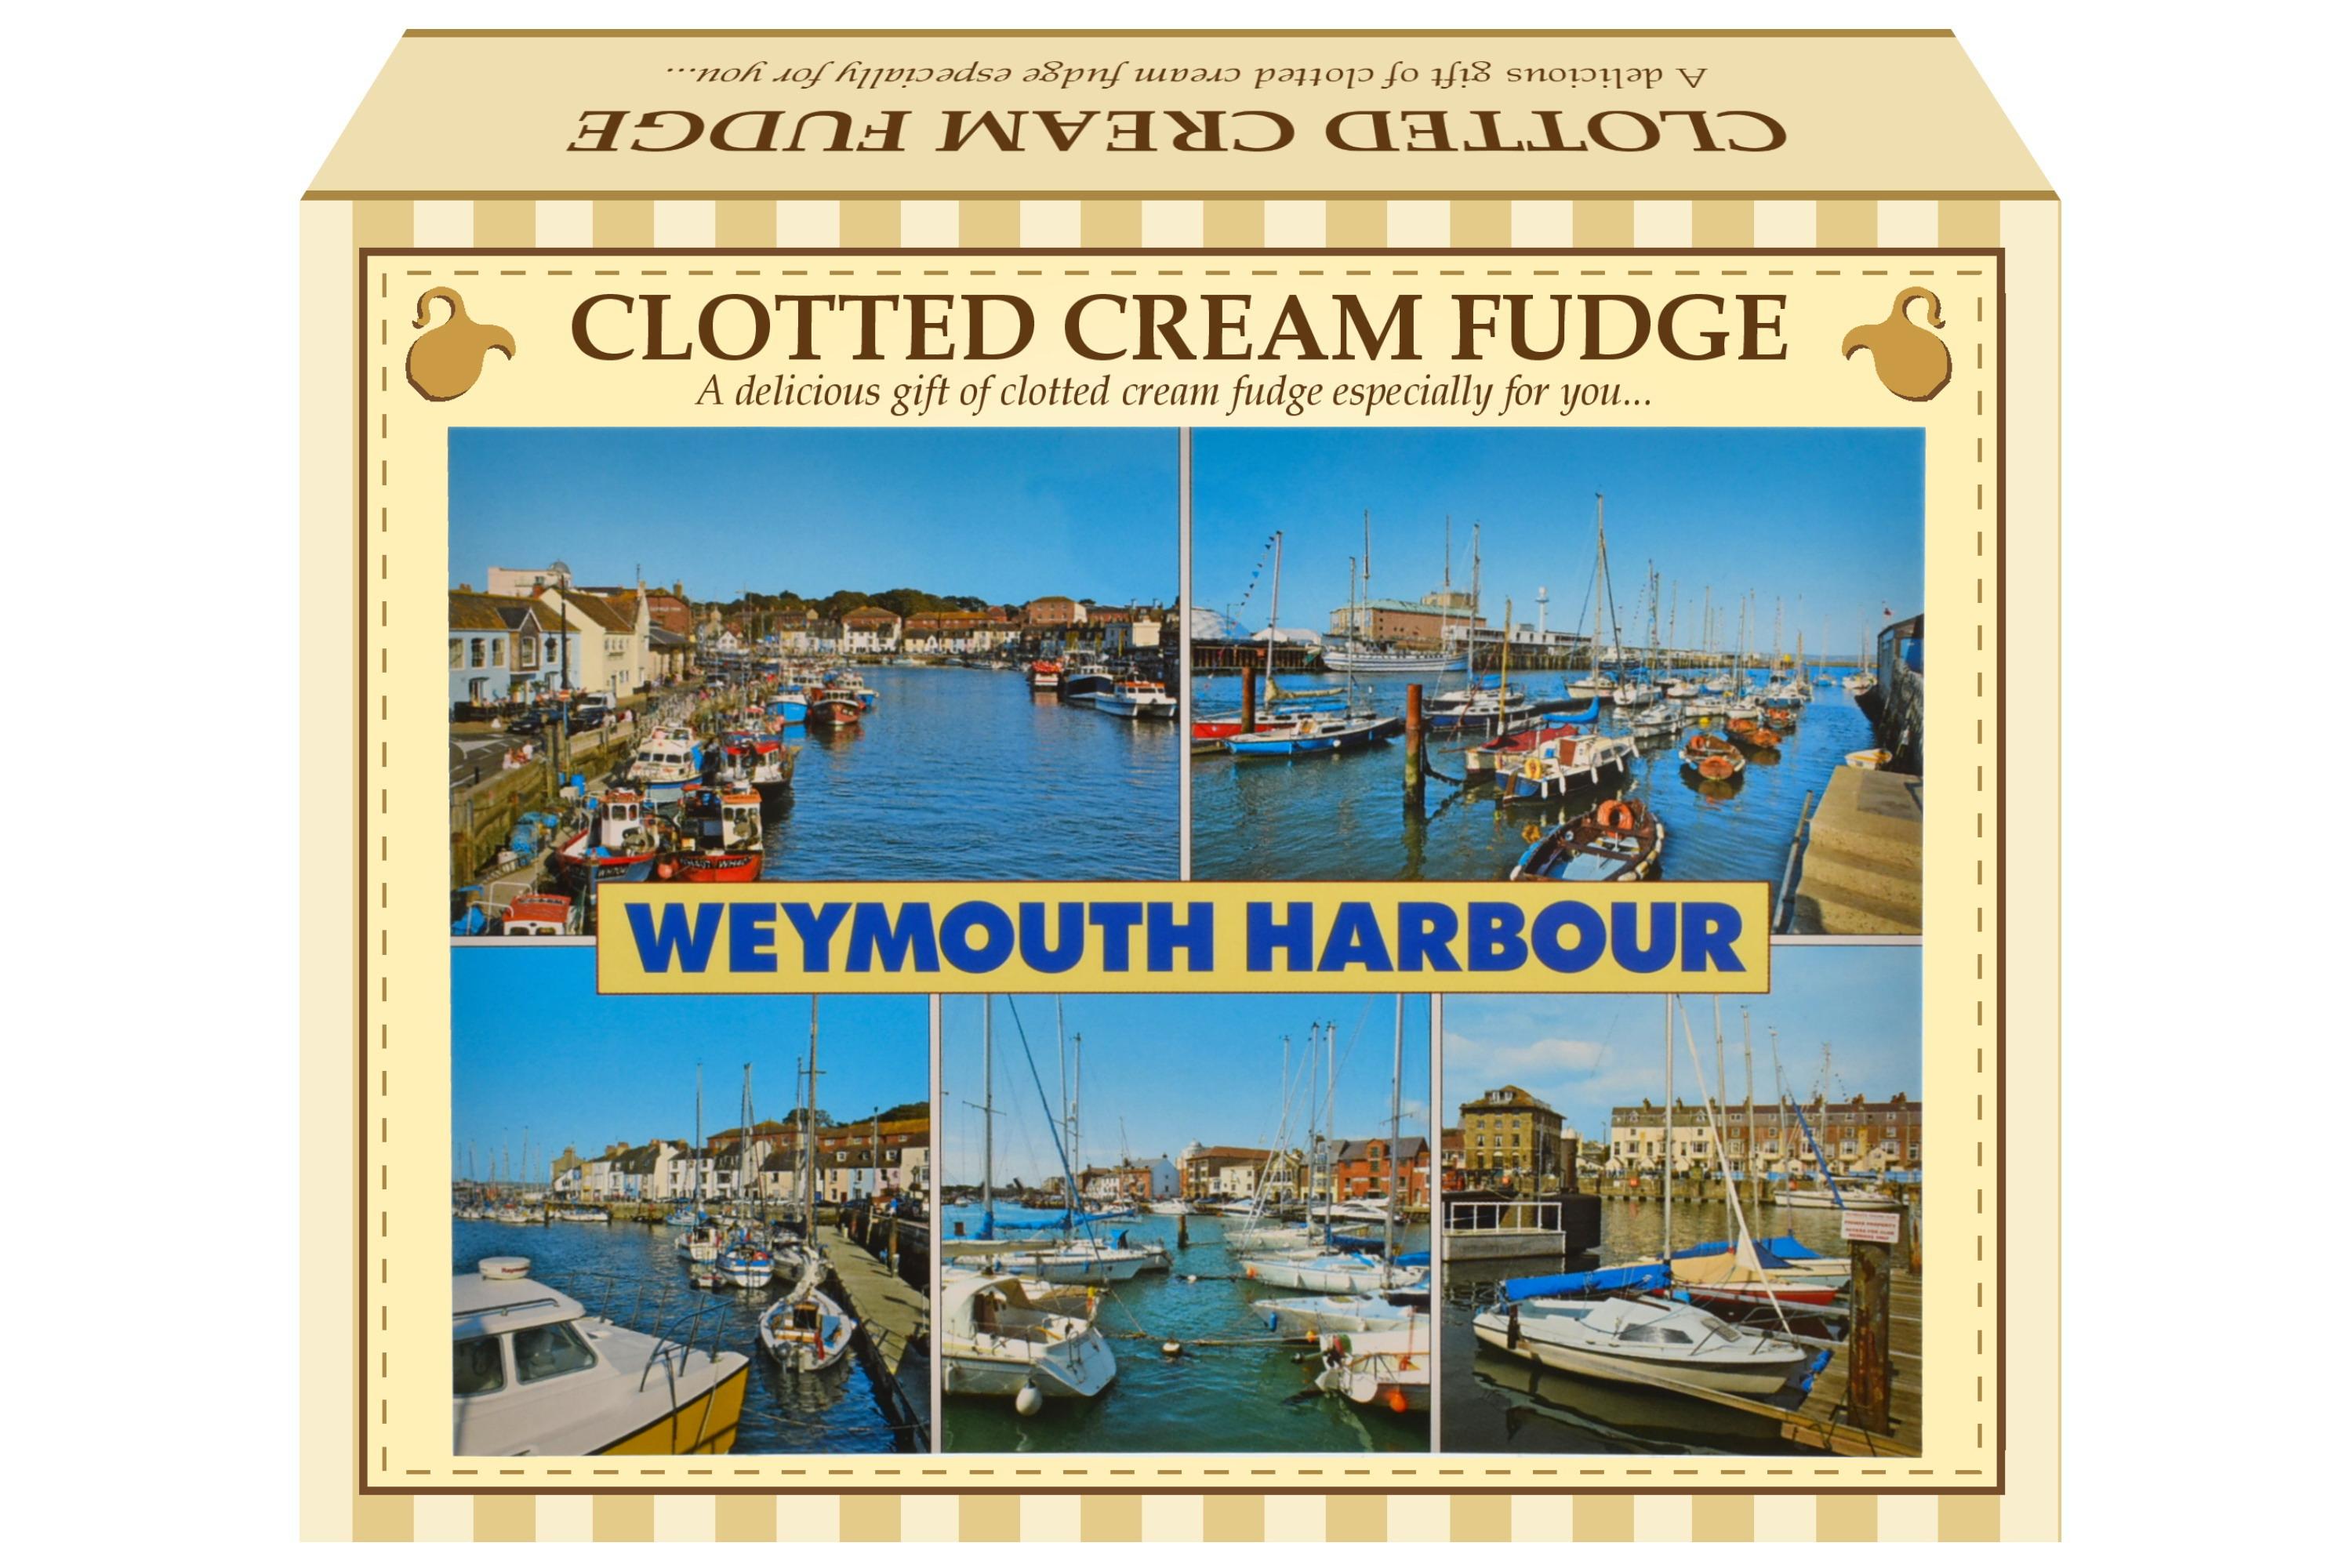 100g Clotted Cream Fudge Postcard Gift Box